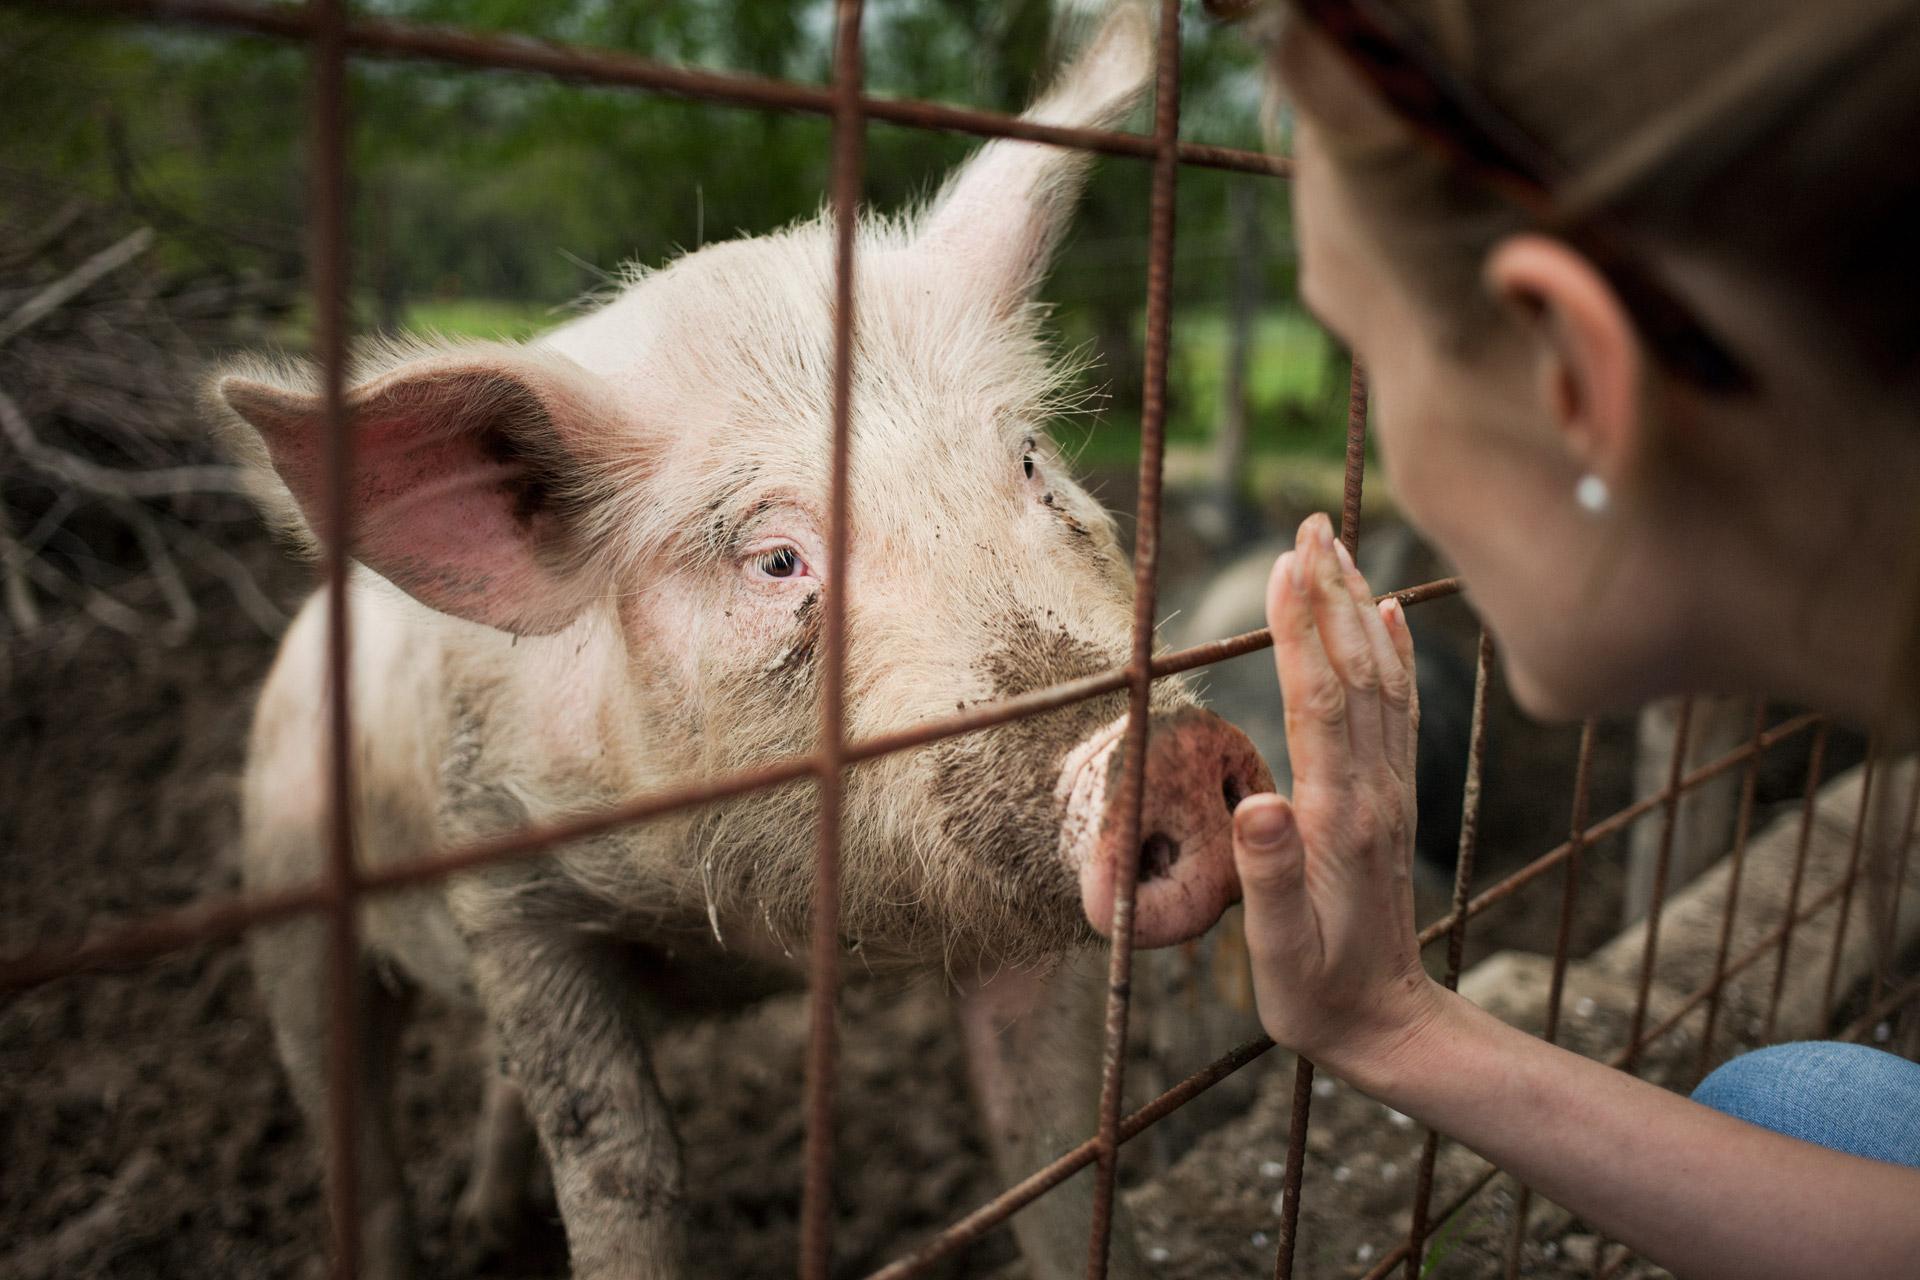 timo-stammberger-photography-fotografie-pig-cute-schwein-woman-erdlingshof-mitgefuehl-interaction-compassion